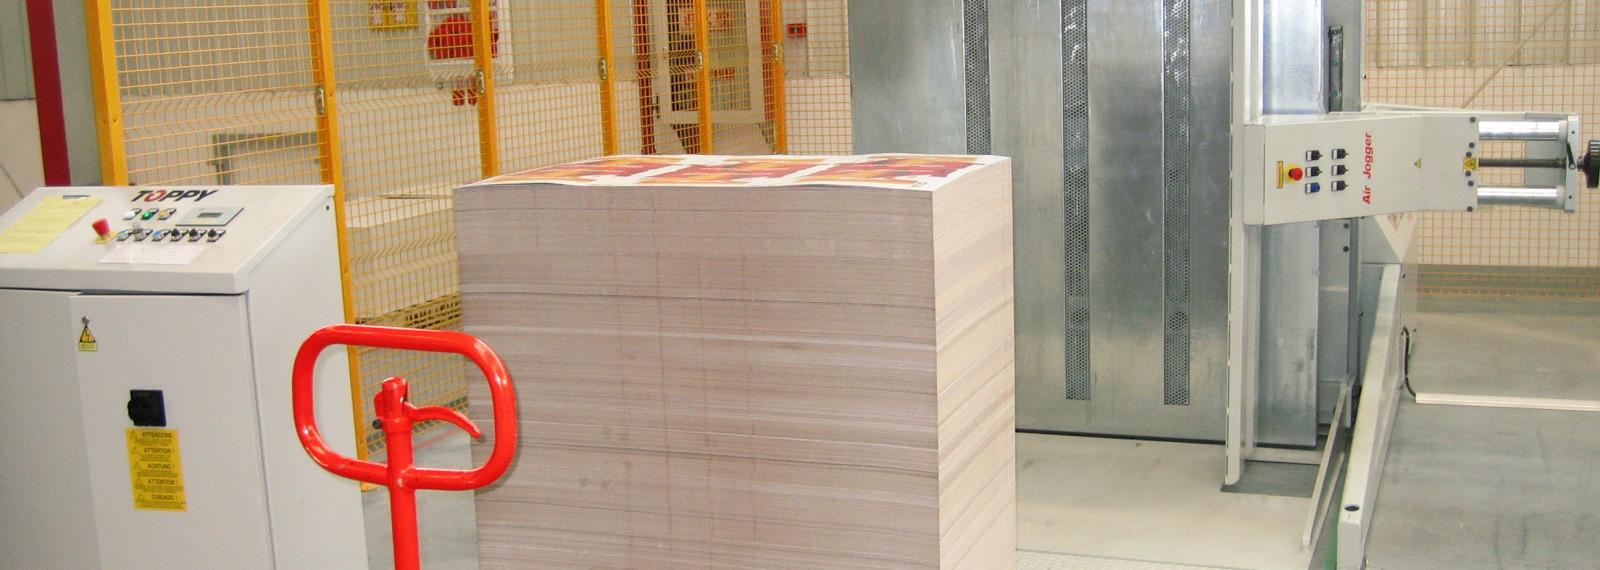 Stationary Load Inverter Pallet Inverter Bulle Pallet: Leader In Load Transfer Systems And Pallet